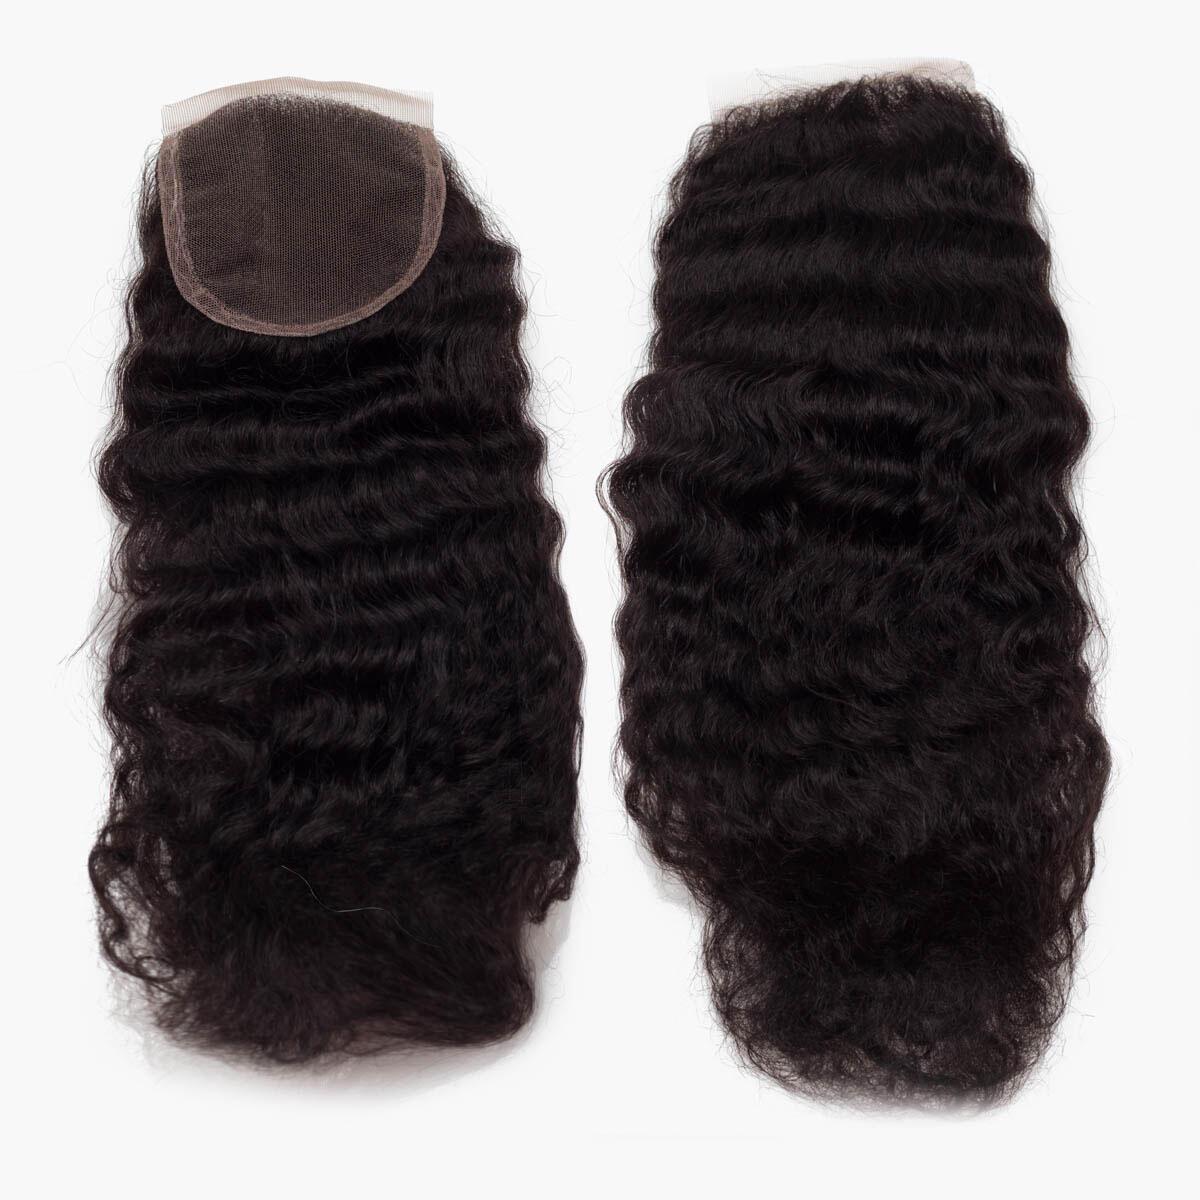 Lace Closure Coily Curl 1.2 Black Brown 25 cm